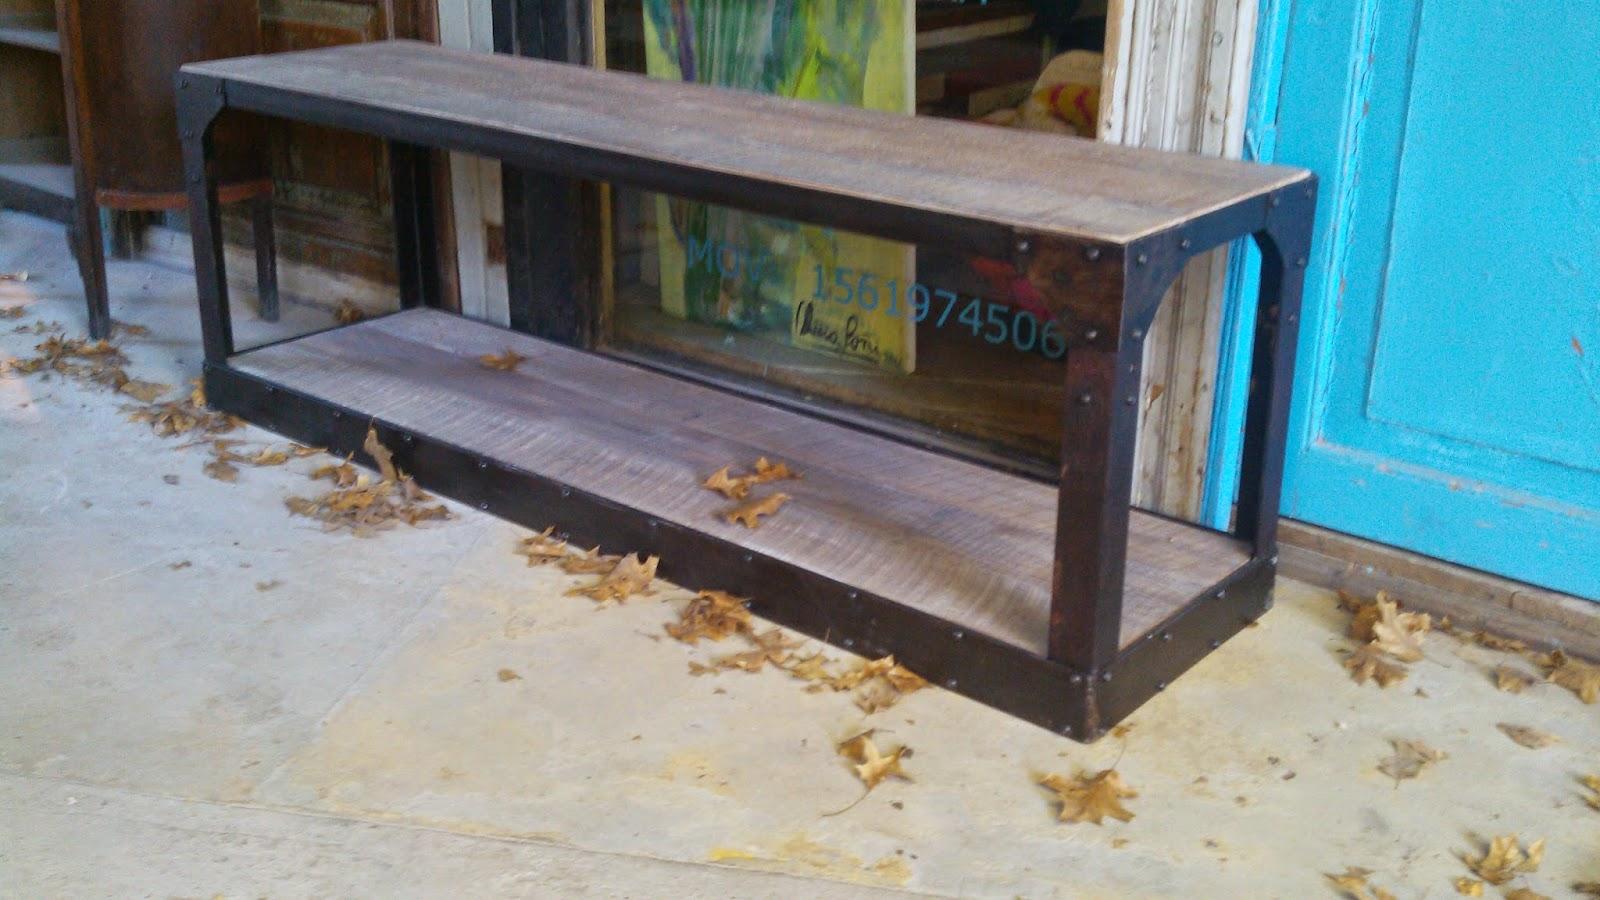 muebles patchwork ruta 27 n 5707 rincon de milberg